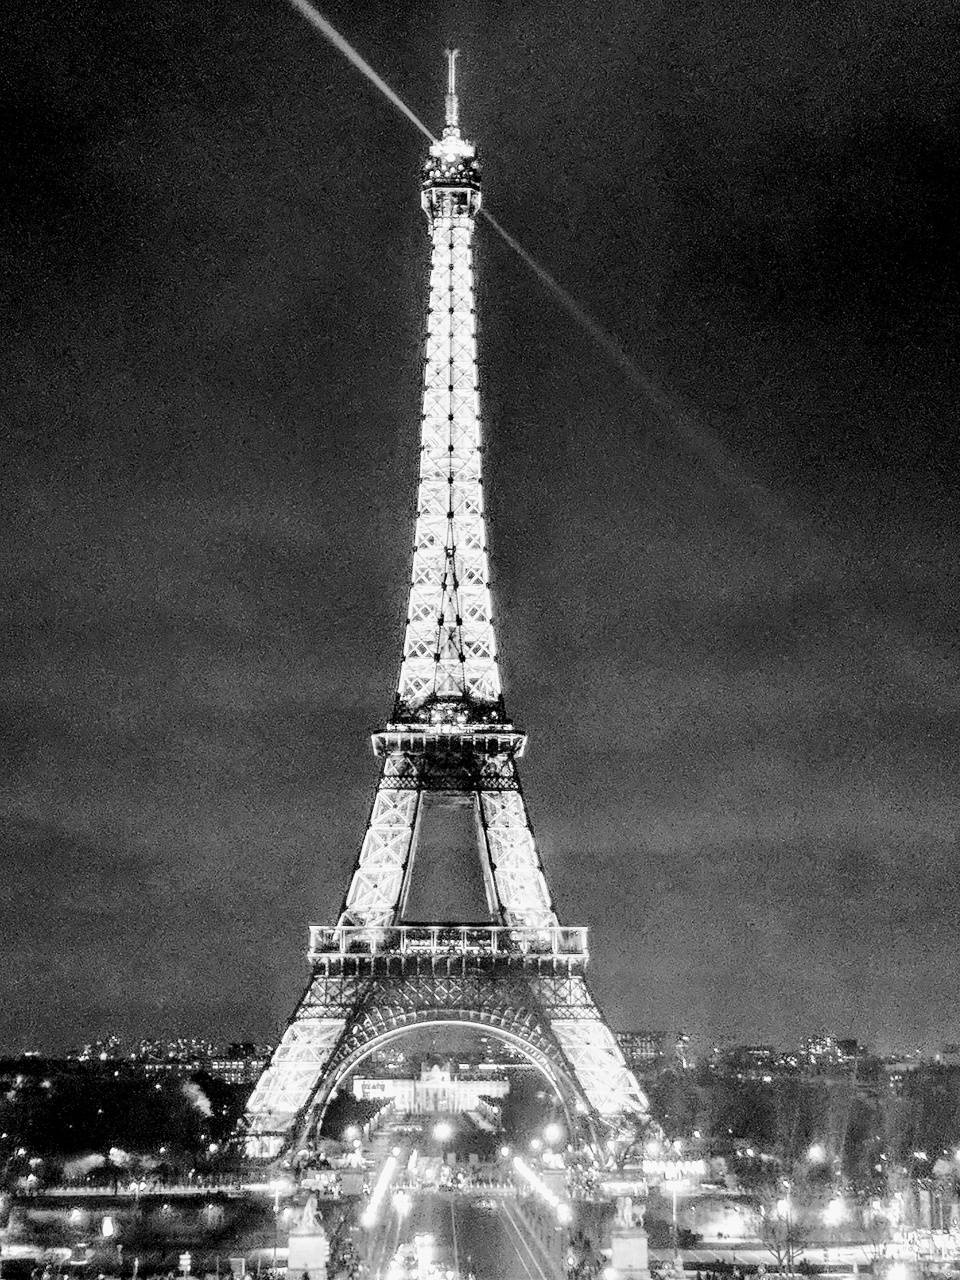 Eiffel Tower Wallpaper By Bojangler 60 Free On Zedge